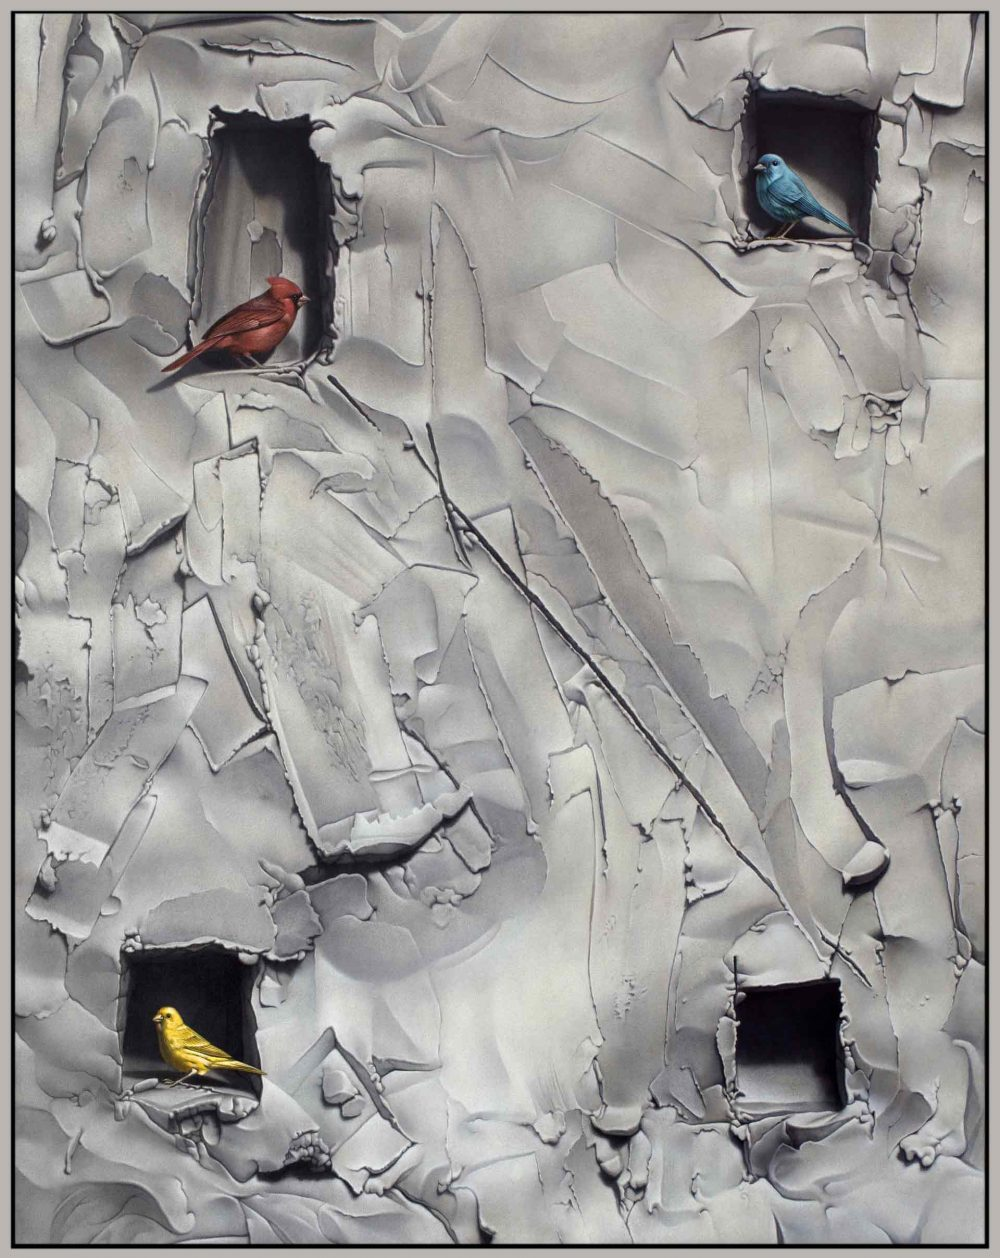 Habitat (2017), Acryl auf Leinwand, 160 x 130 cm